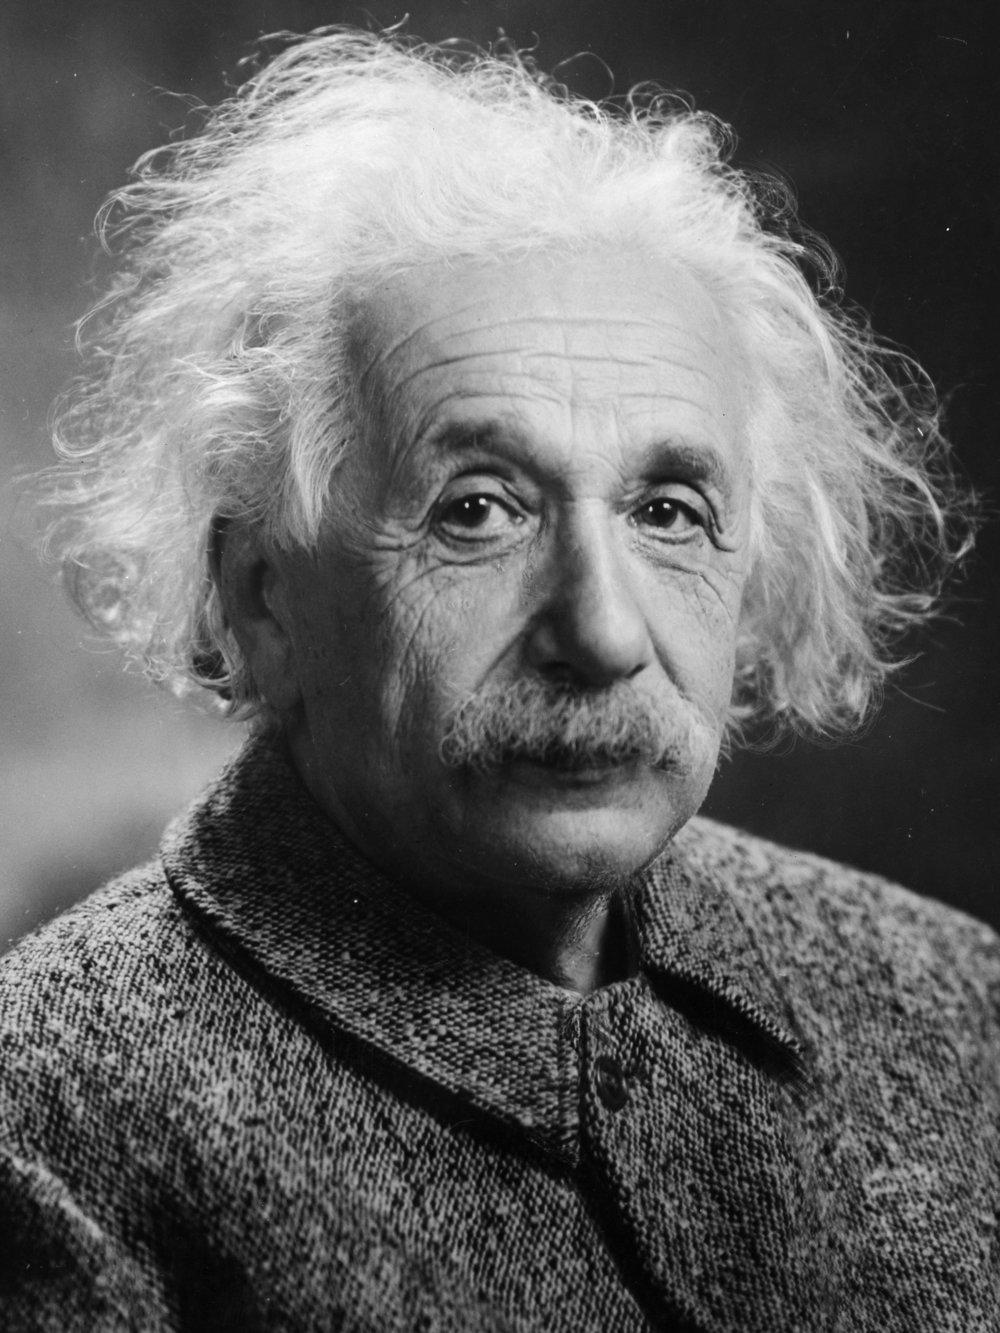 Albert Einstein. Credit: Orren Jack Turner via Wikimedia Commons.